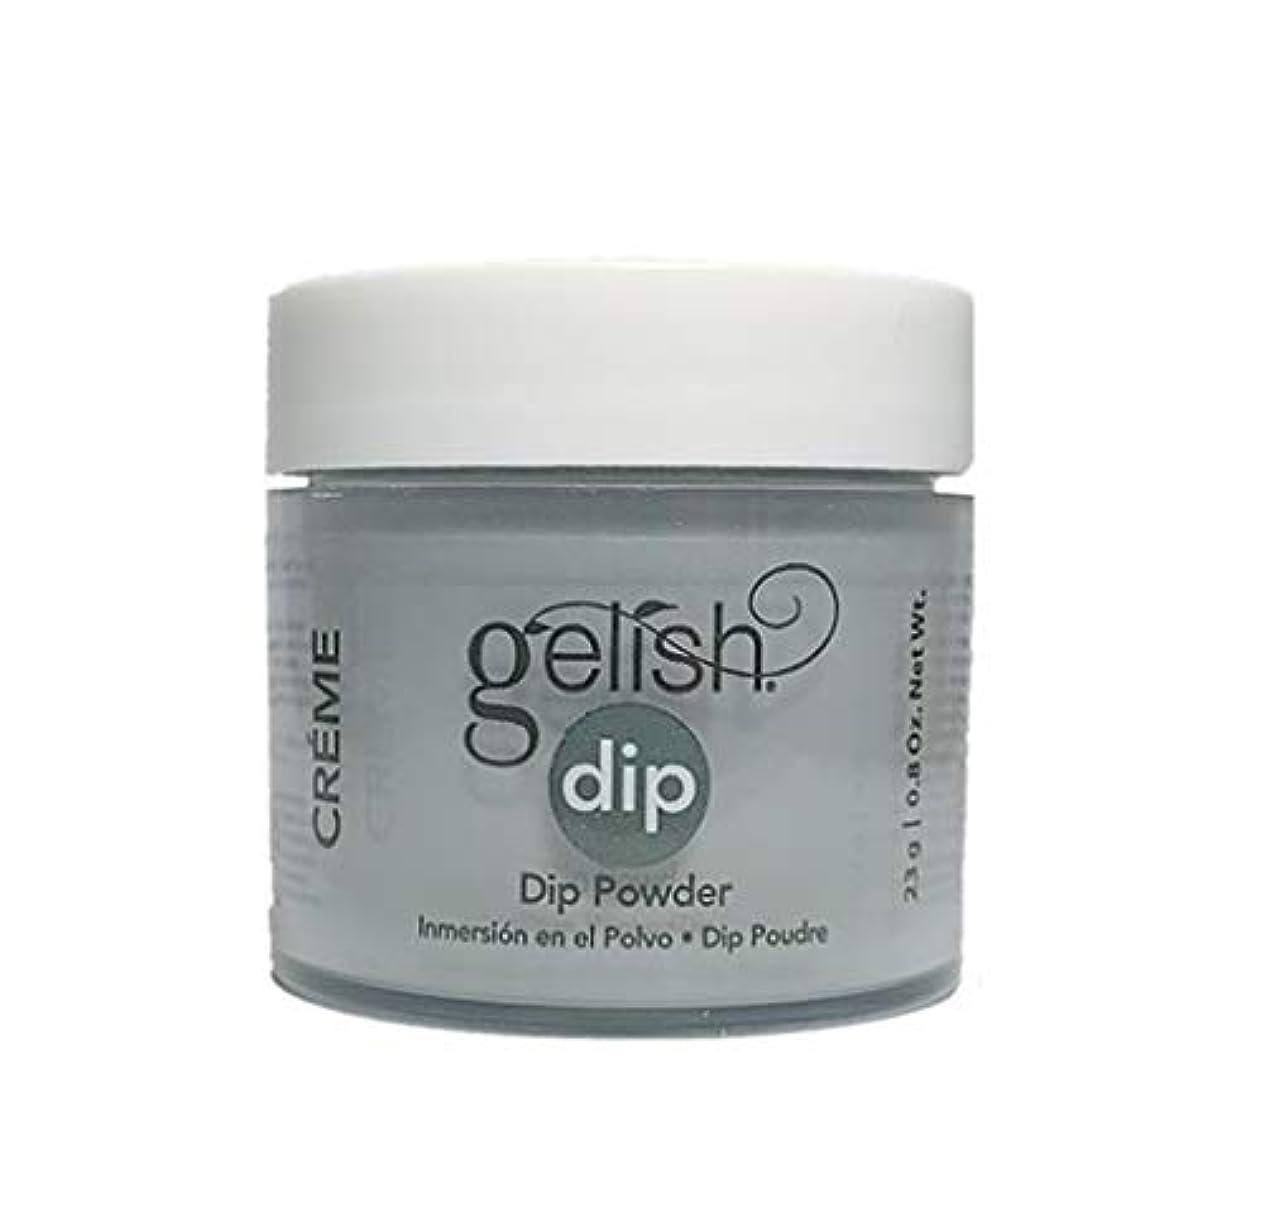 Harmony Gelish - Dip Powder - Fashion Week Chic - 23g / 0.8oz